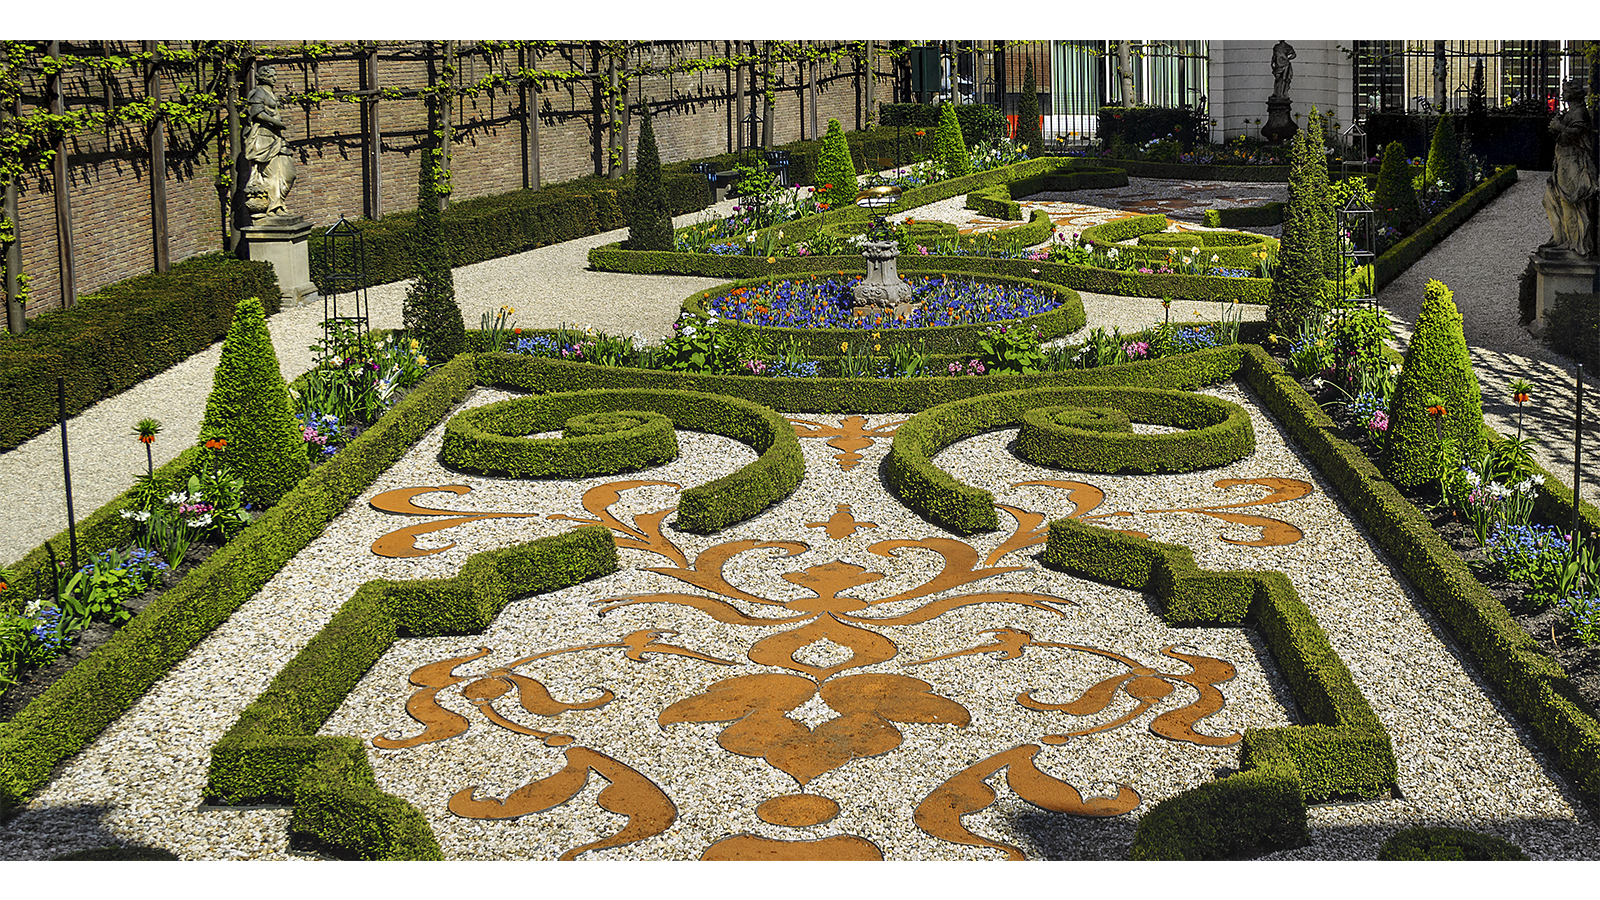 Captivating Best U0027secretu0027 Urban Gardens Around The World   CNN Travel